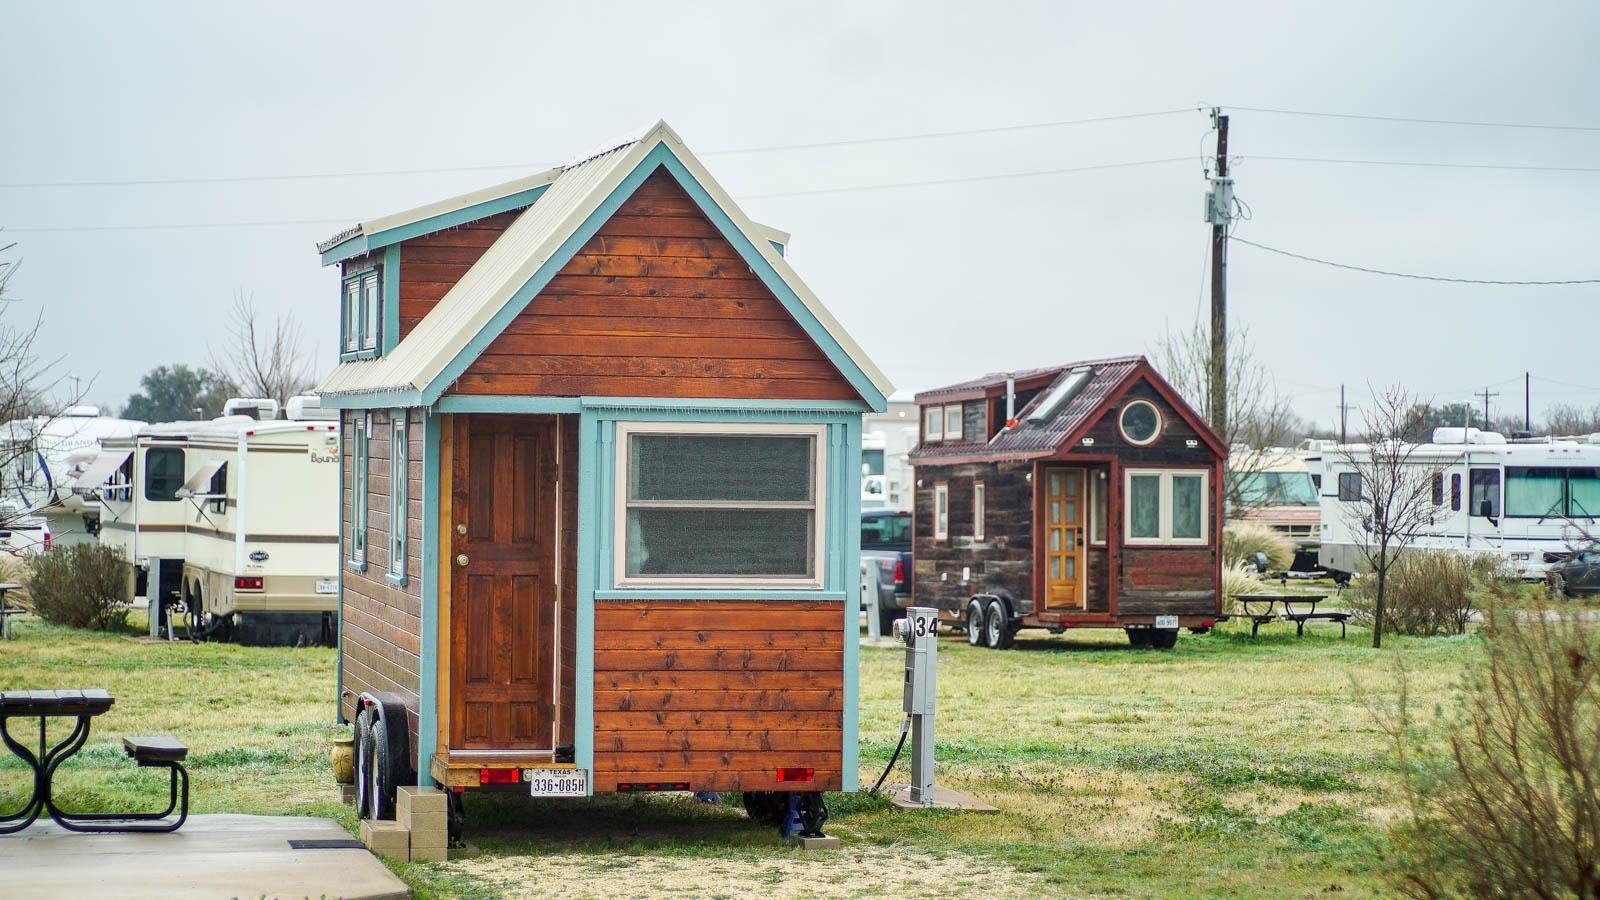 Tiny Home Designs: Austin, TX: Crash Landing & Tree House Tours